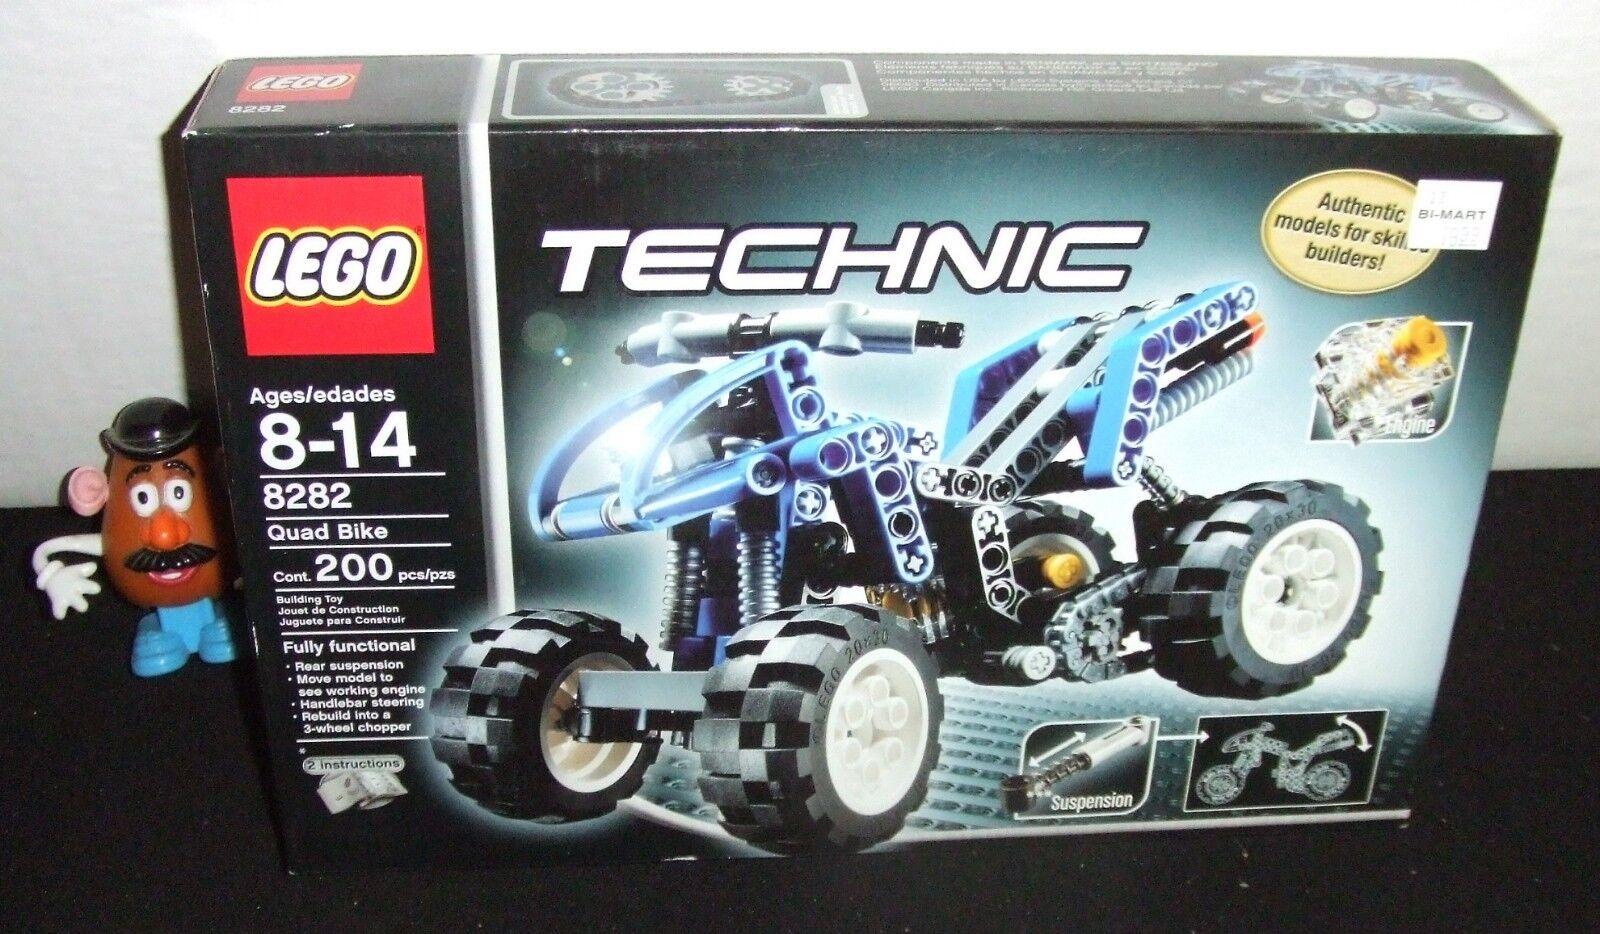 LEGO TECHNIC QUAD QUAD QUAD BIKE   3 WHEEL CHOPPER 200pc BOXED SET 2006 NEW UNOPENED a0c3e7